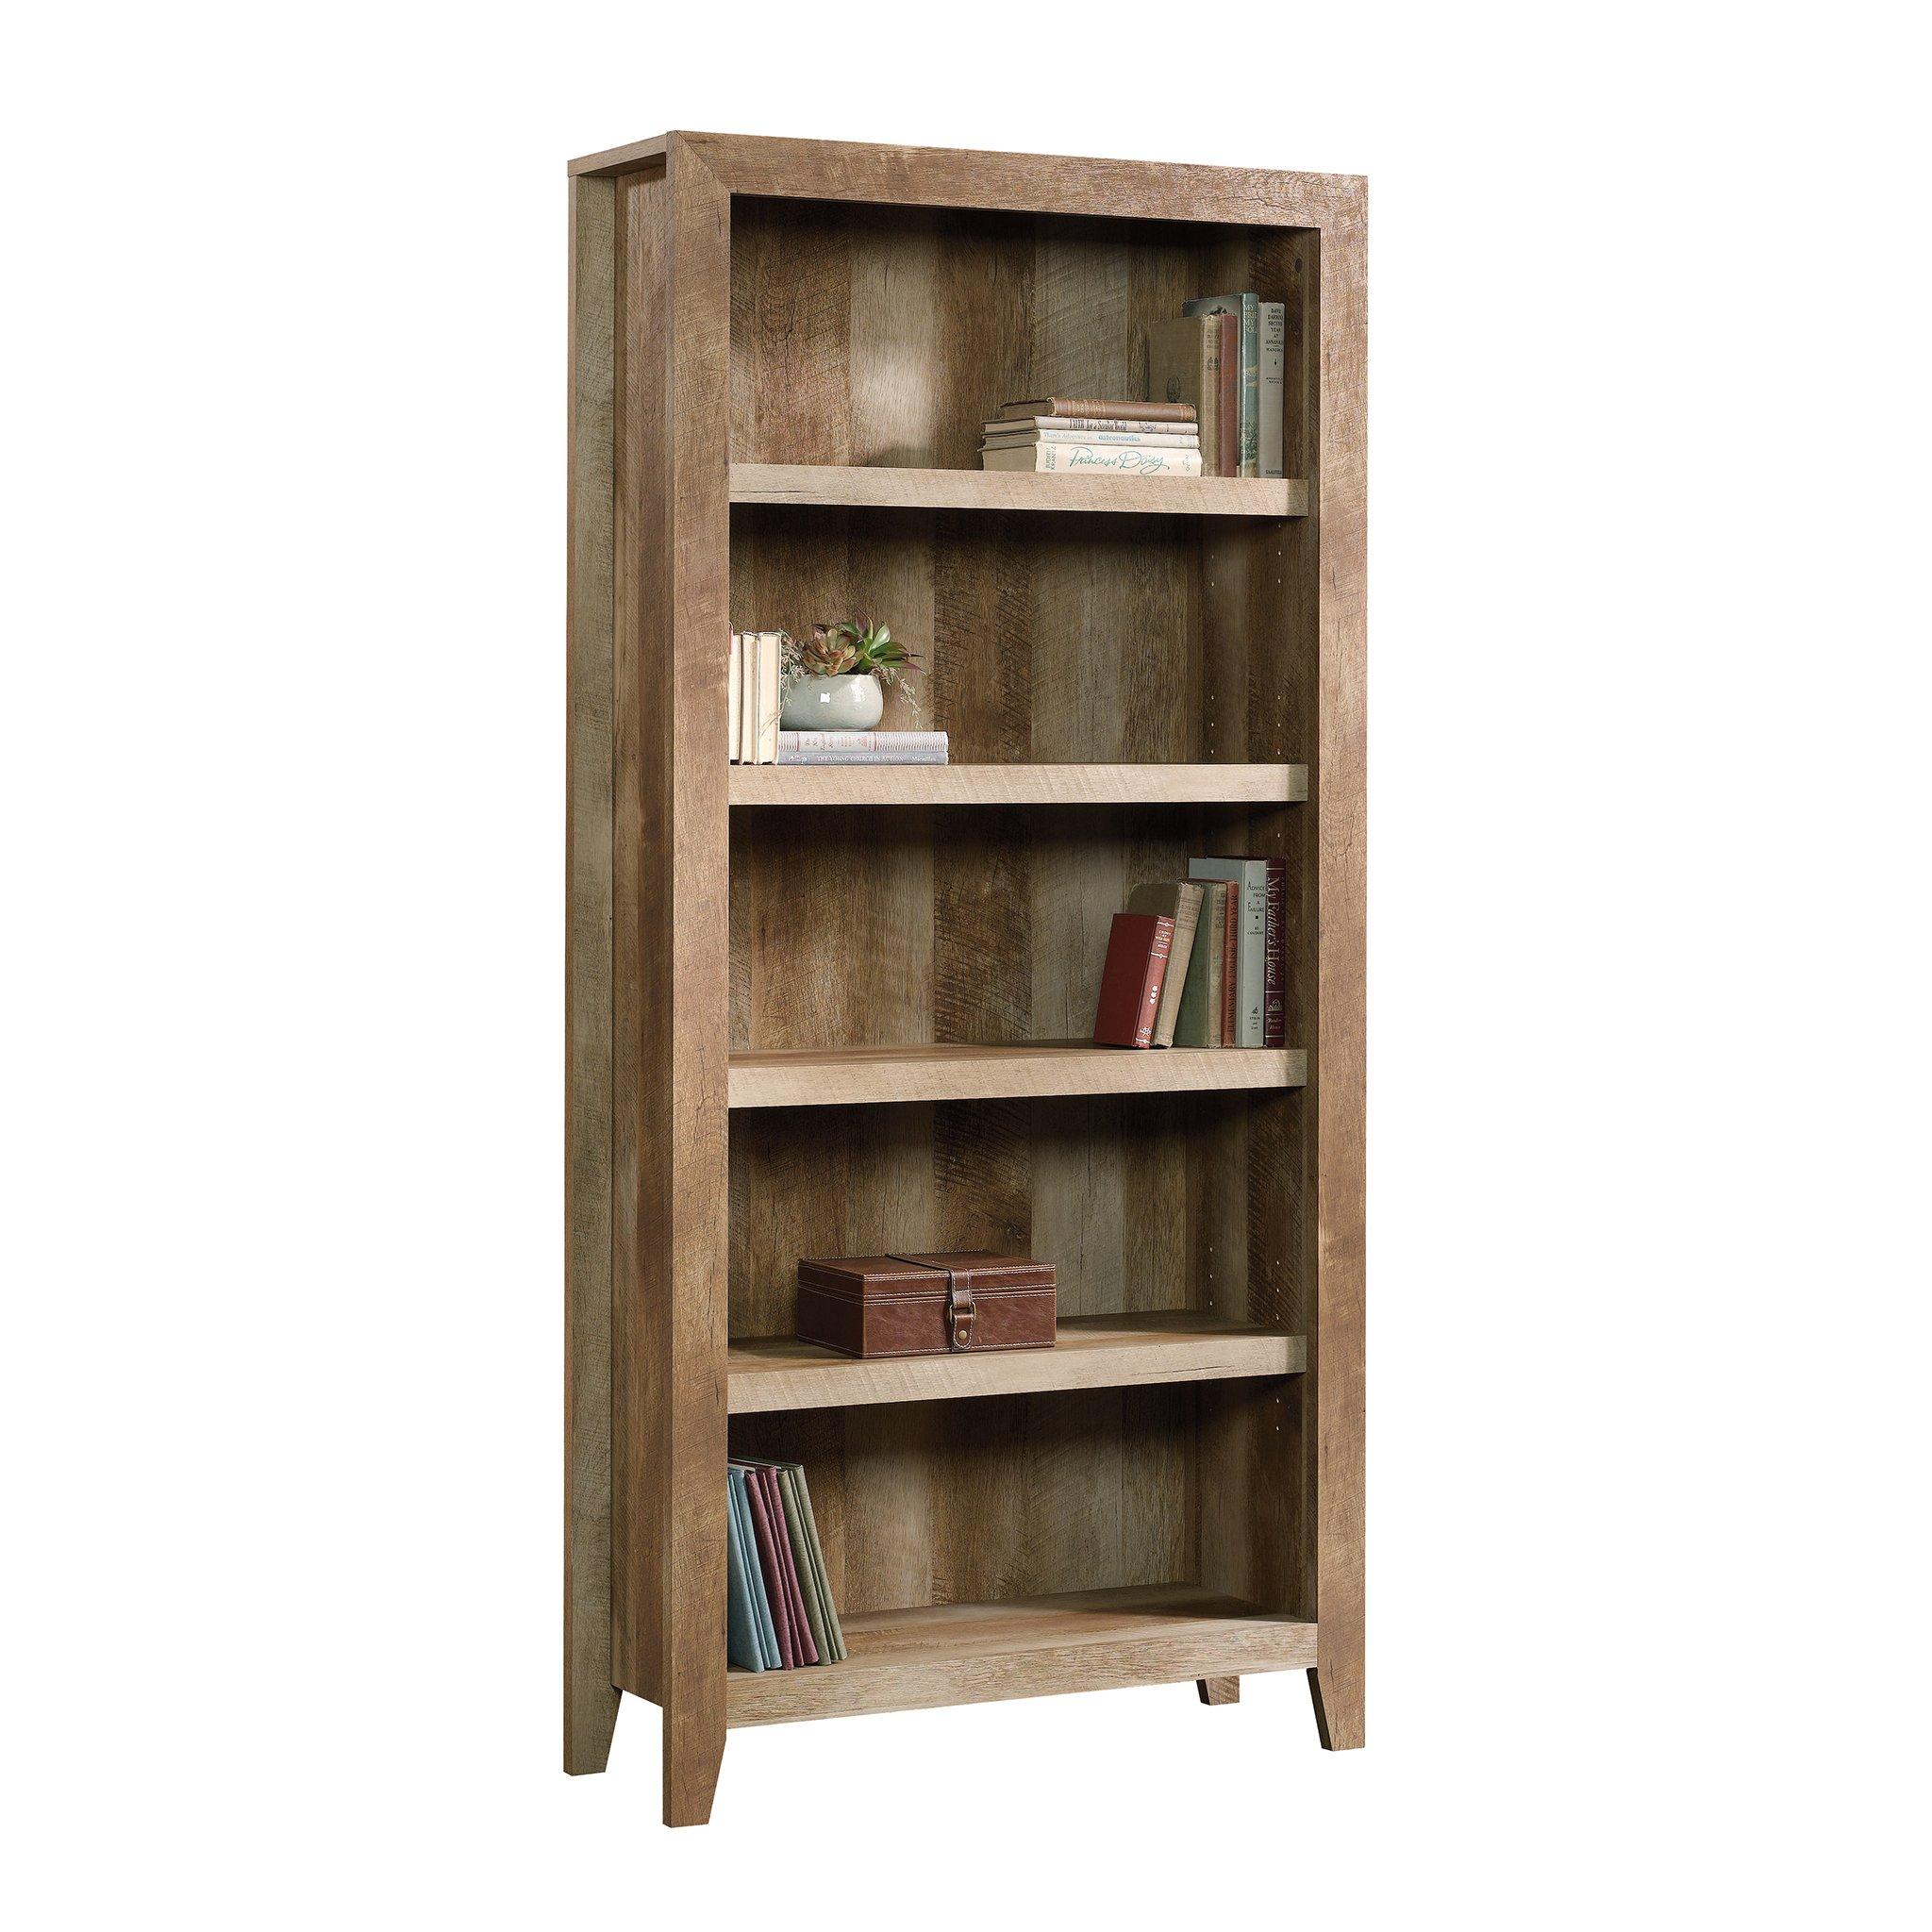 Sauder 418546 Dakota Pass 5-Shelf Bookcase, L: 33.78'' x W: 12.52'' x H: 71.1, Craftsman Oak finish by Sauder (Image #3)